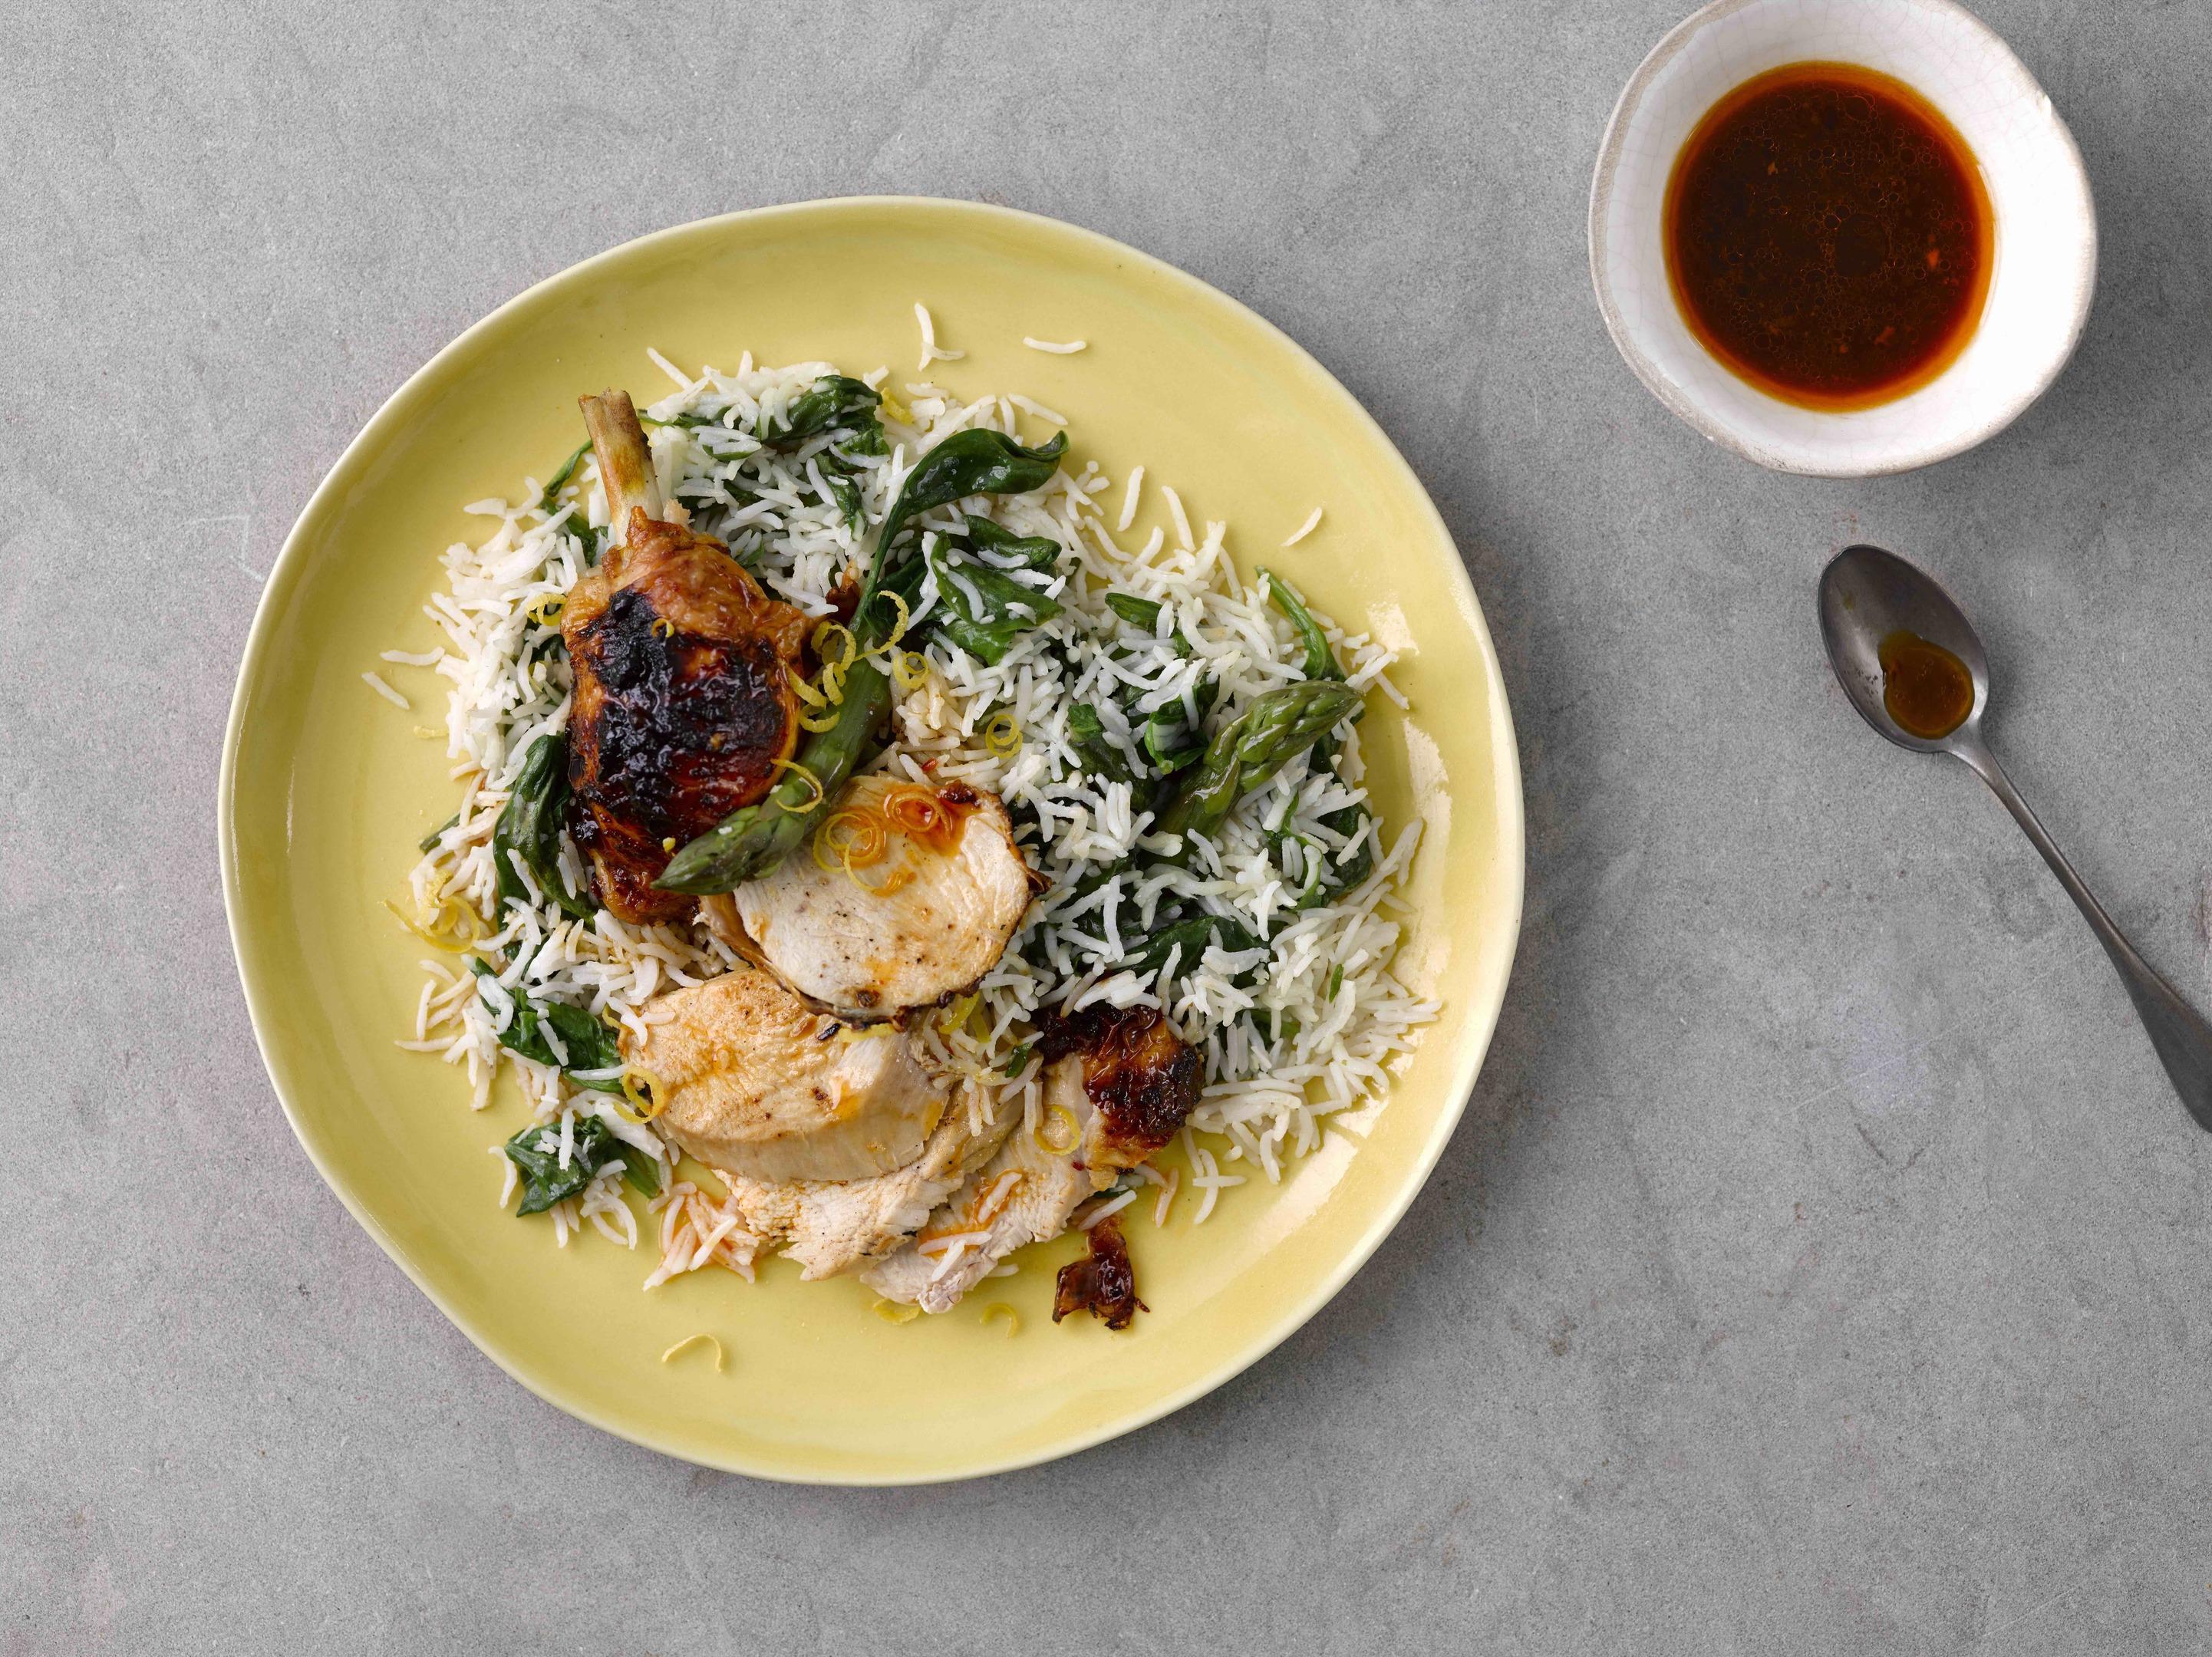 The delicious lemon and chilli chicken recipe from Tilda